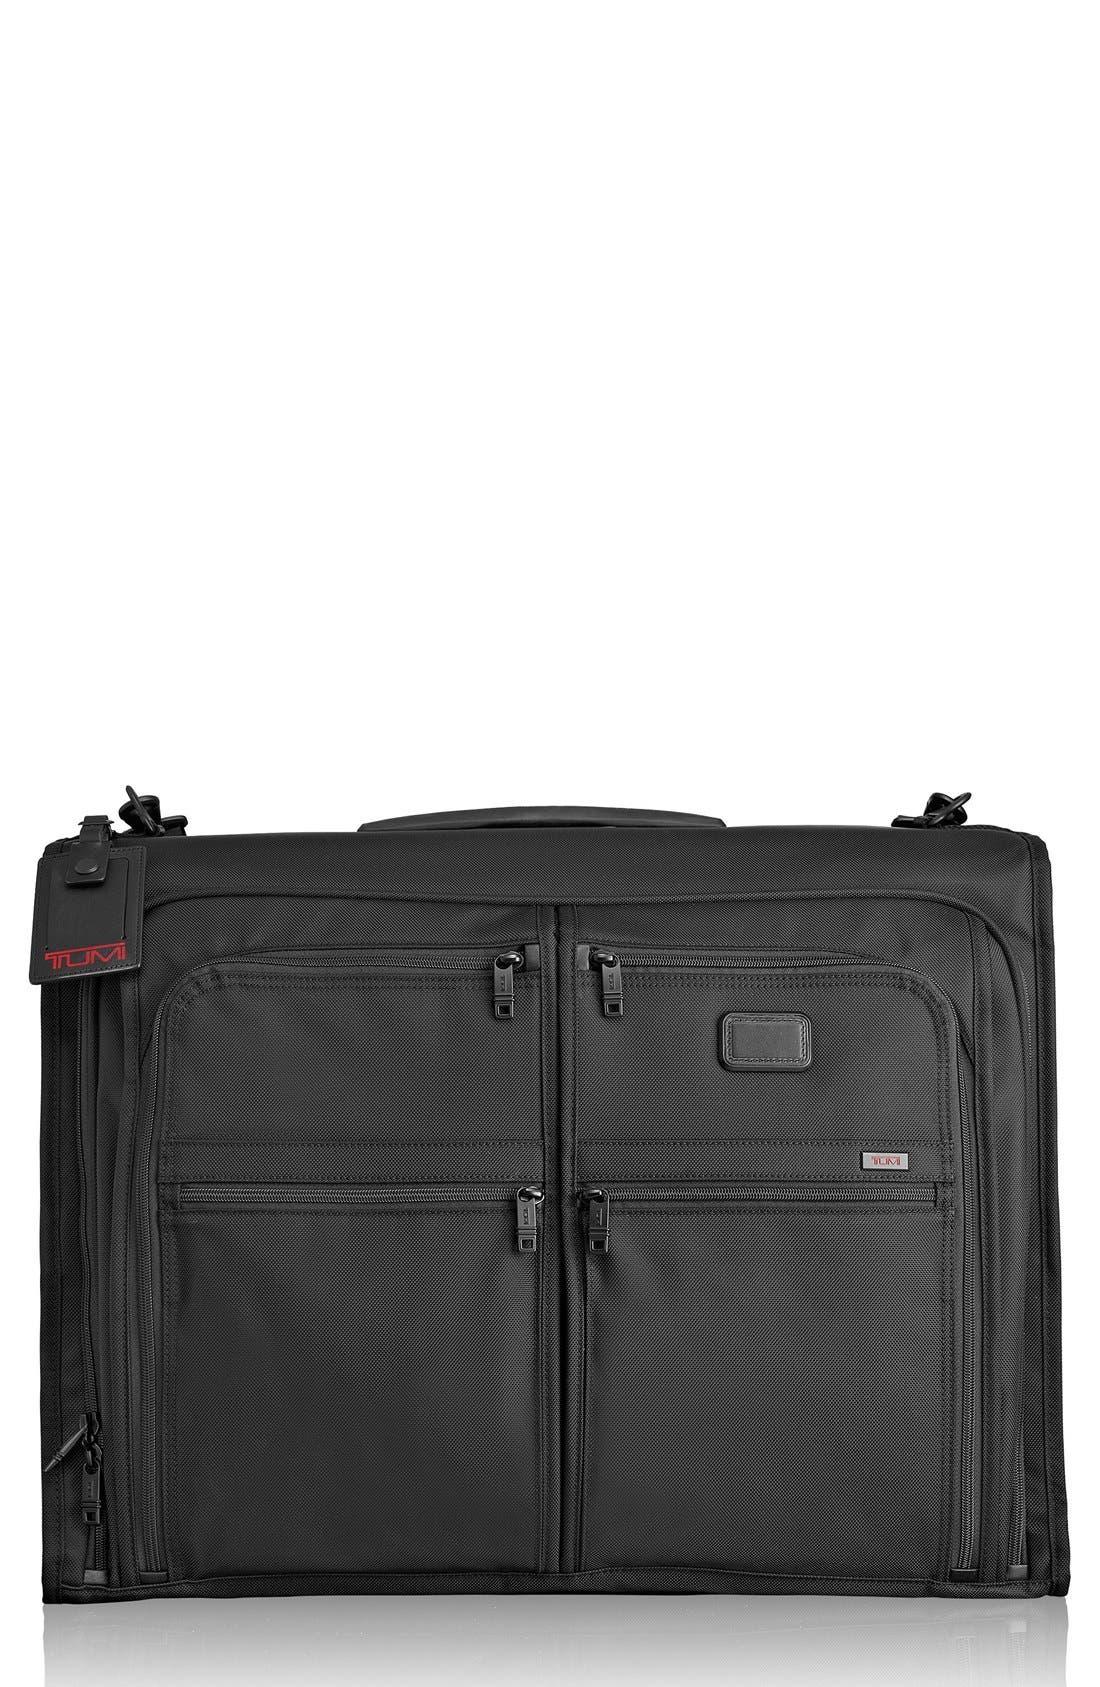 Alternate Image 1 Selected - Tumi 'Alpha 2' Classic Garment Bag